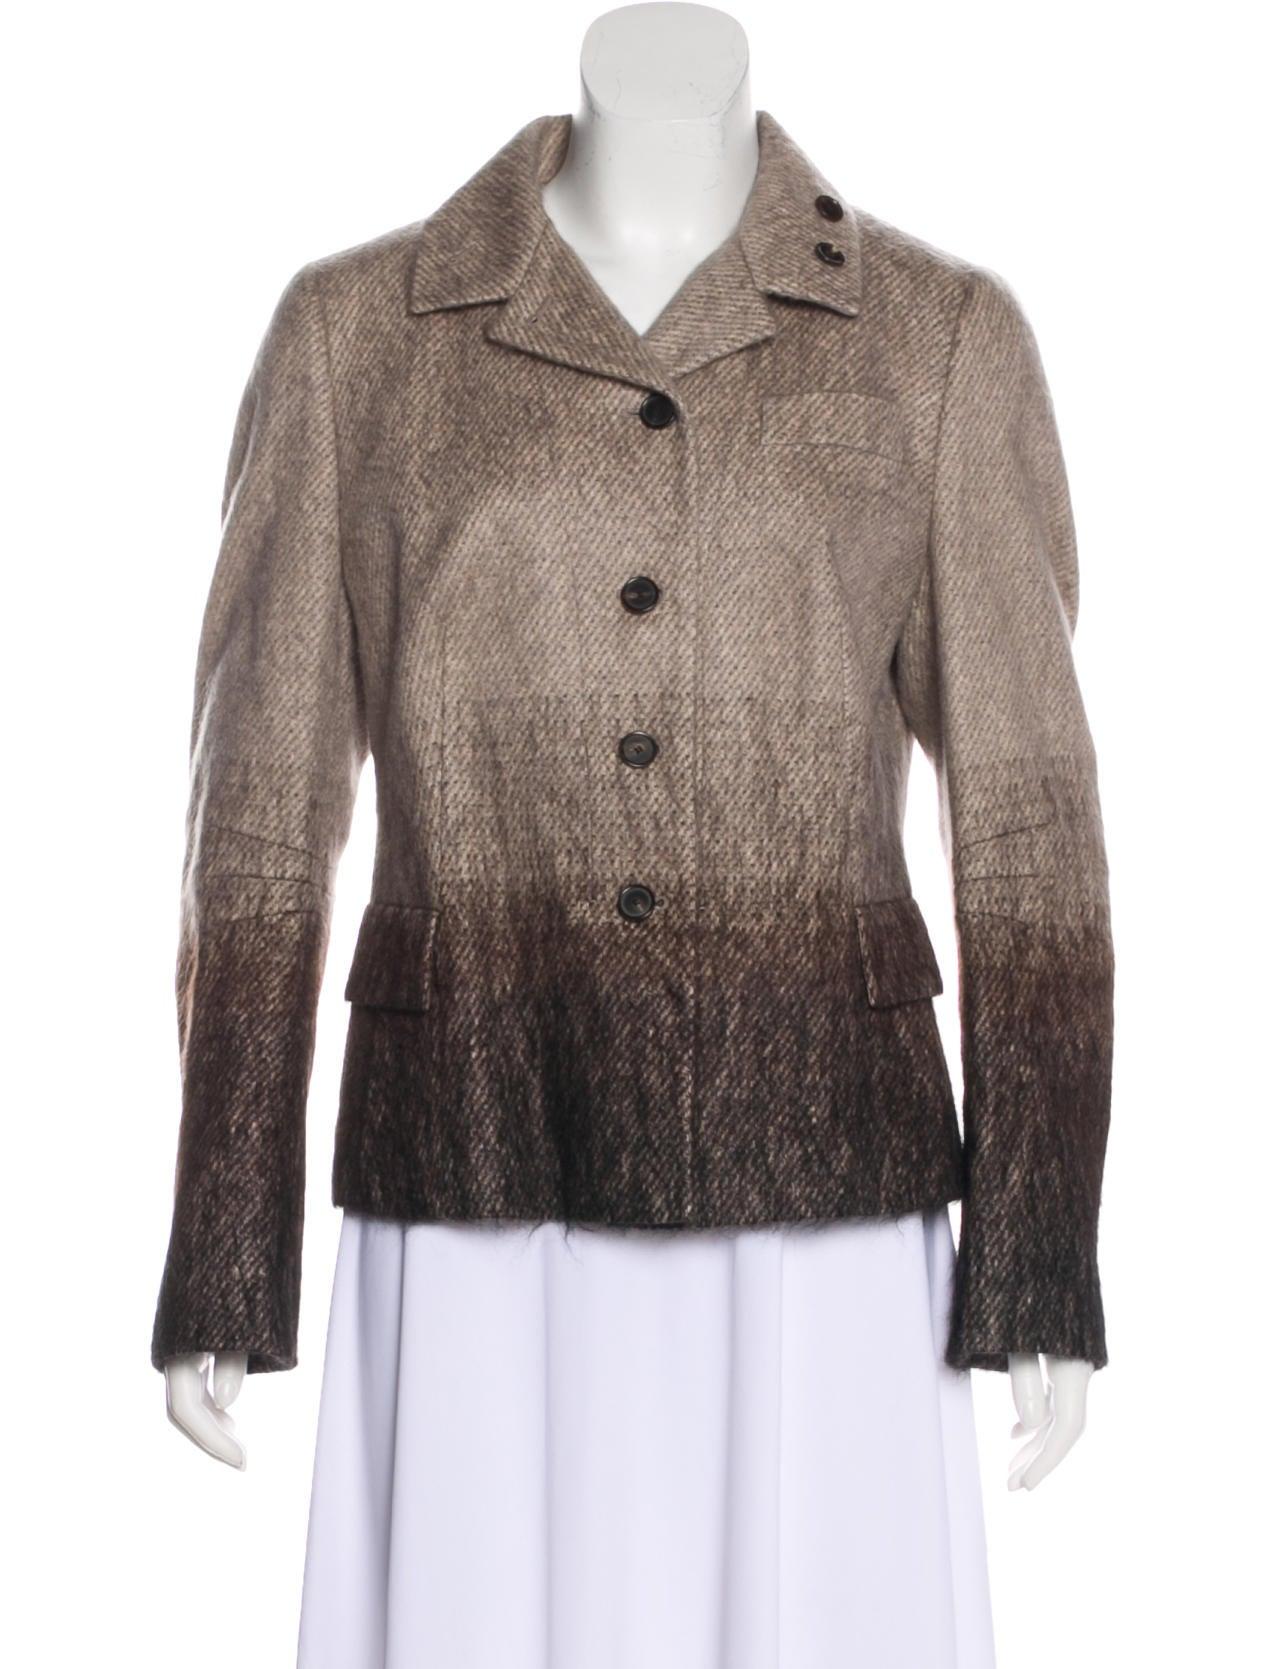 Akris Punto Button-Up Wool Jacket Clearance Shop Websites Cheap Online c0aDt